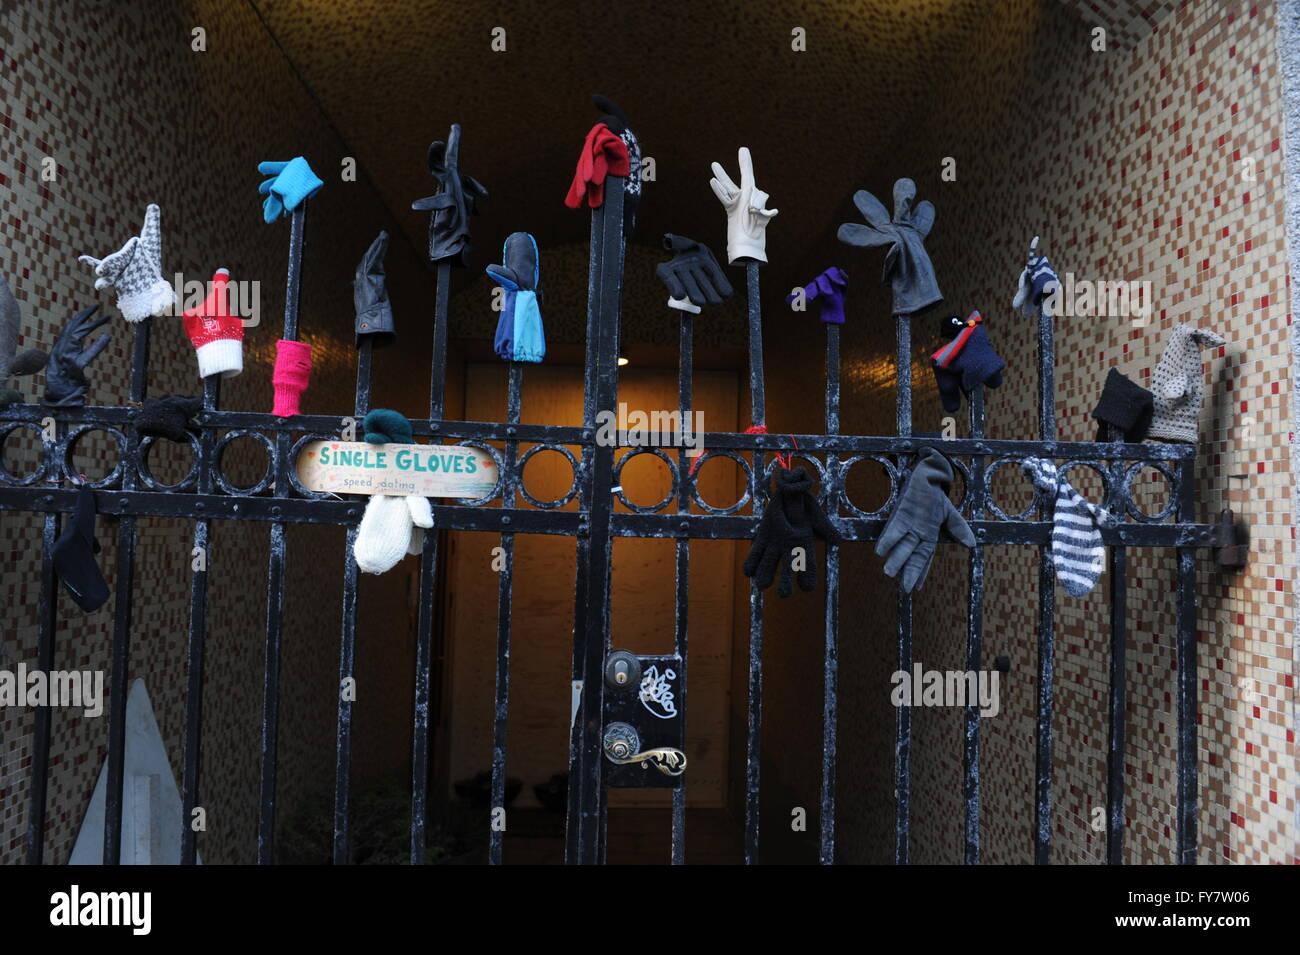 single handschoenen speed dating Reykjavik Wie is Gigi uit jerseylicious dating nu 2014